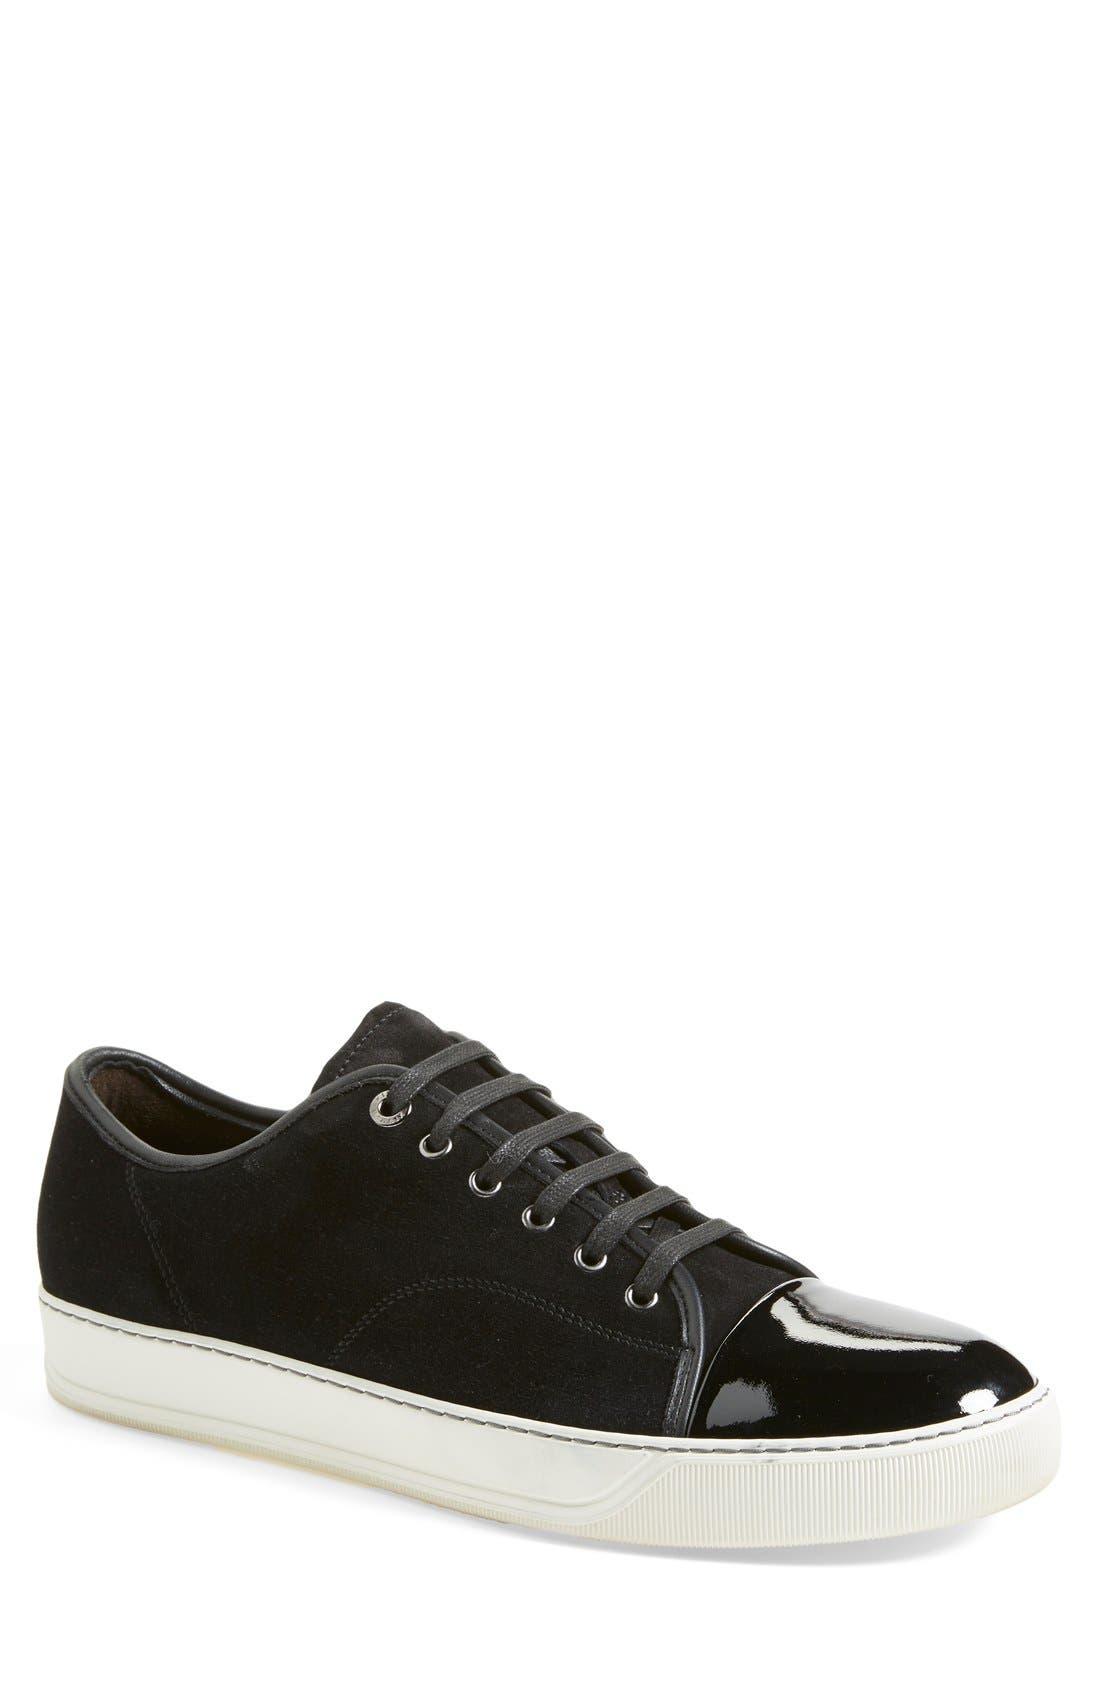 LANVIN Low Top Suede Sneaker, Main, color, BLACK